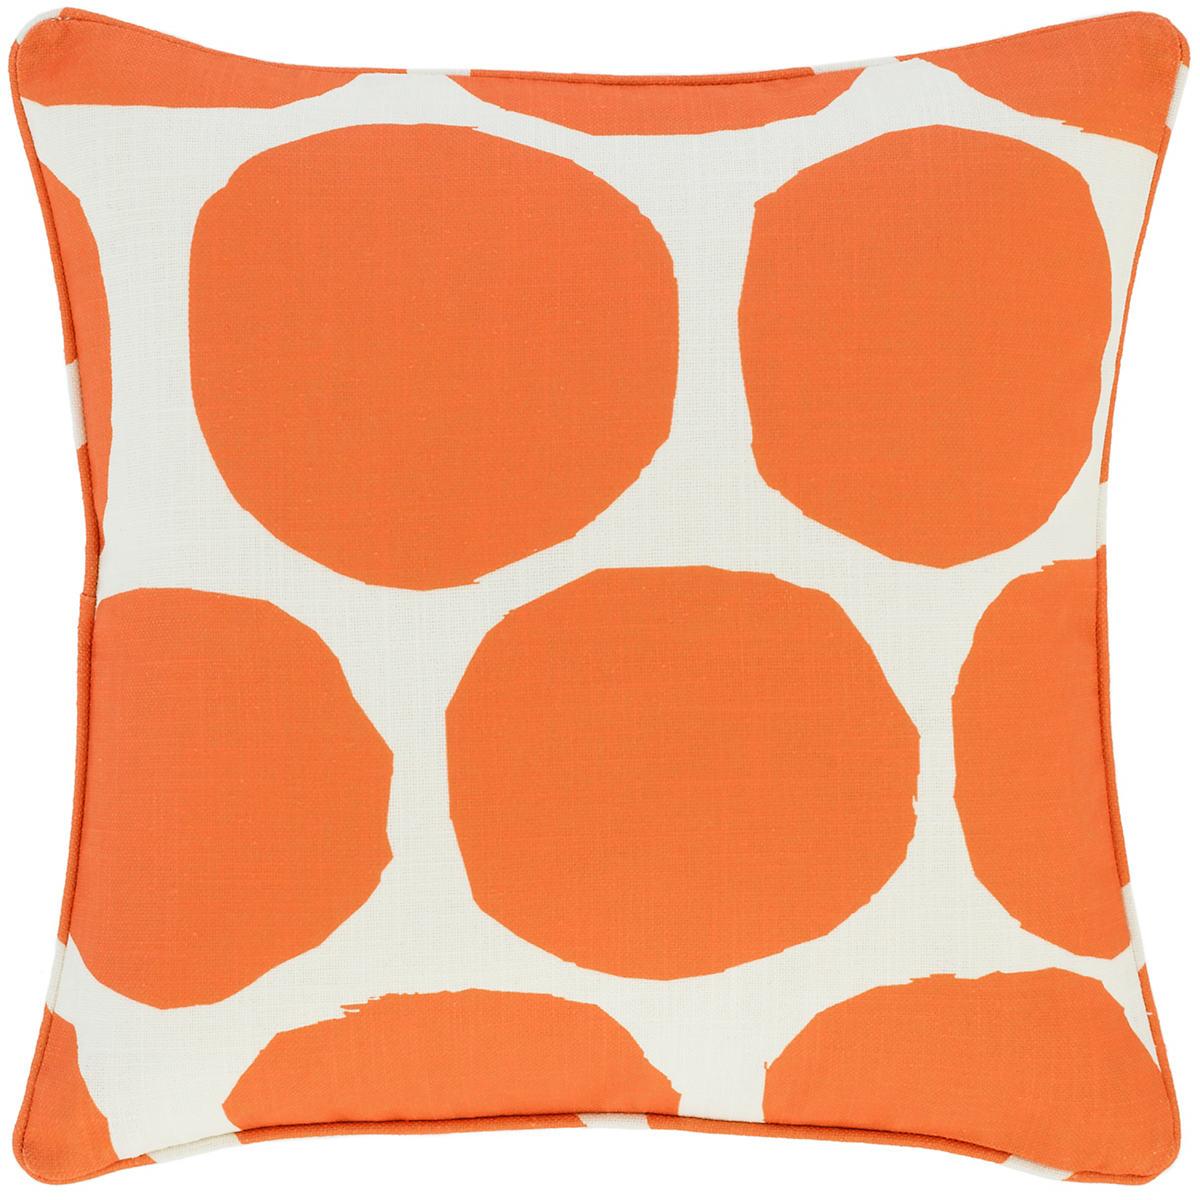 On The Spot Orange Indoor/Outdoor Decorative Pillow